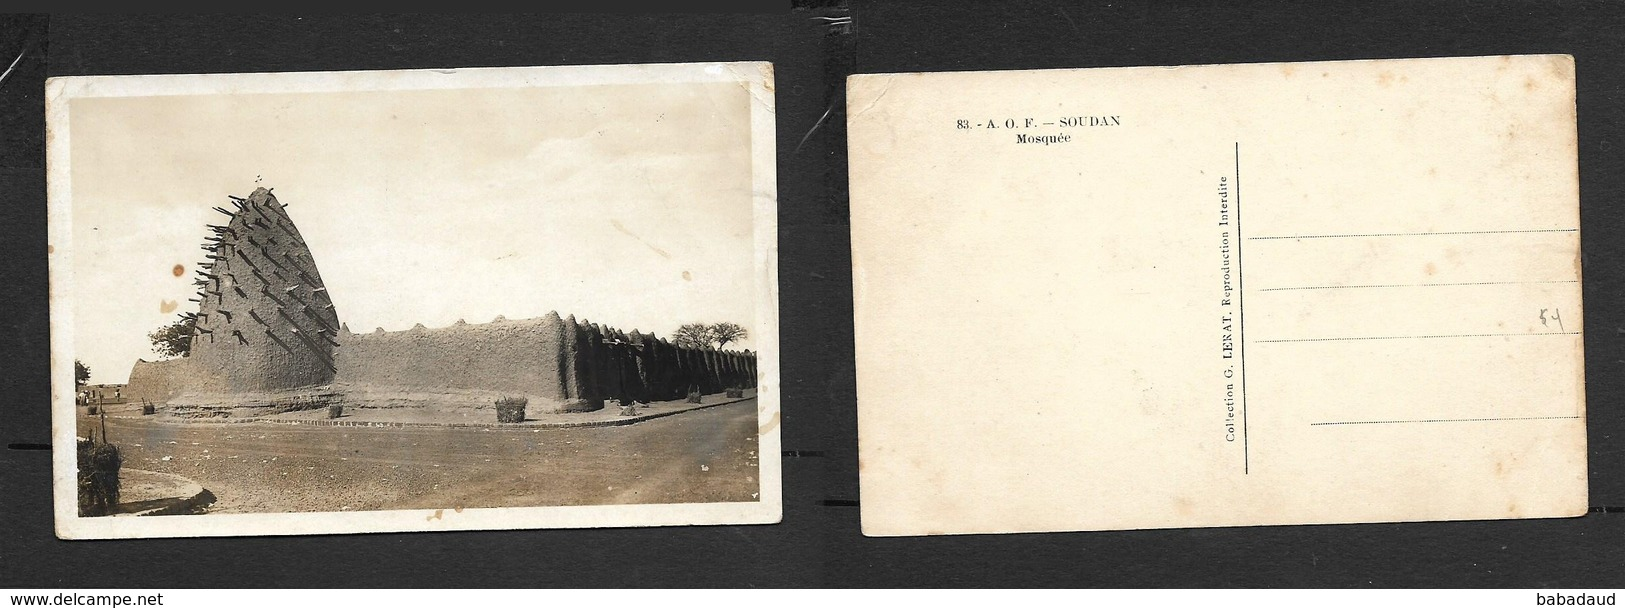 French Sudan (A.O.F.) No 83, Mosquee, Photo - Kenya